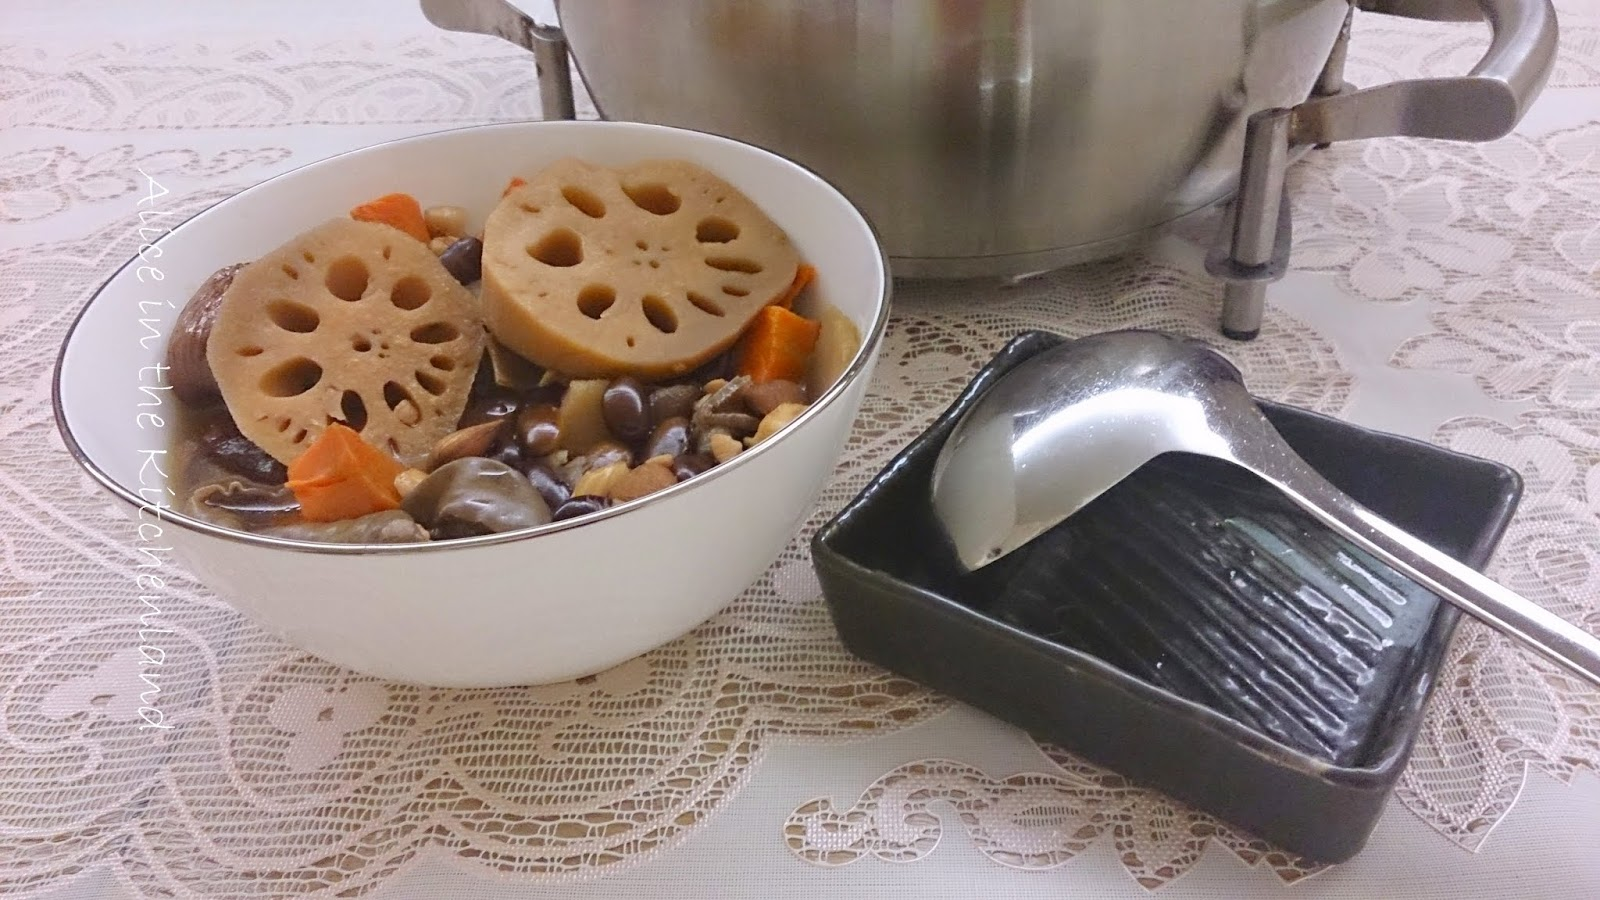 黑木耳蓮藕素湯(調理生理期間不適)~☣~Black Fungus Lotus Vegetarian Soup | Alice in the Kitchenland